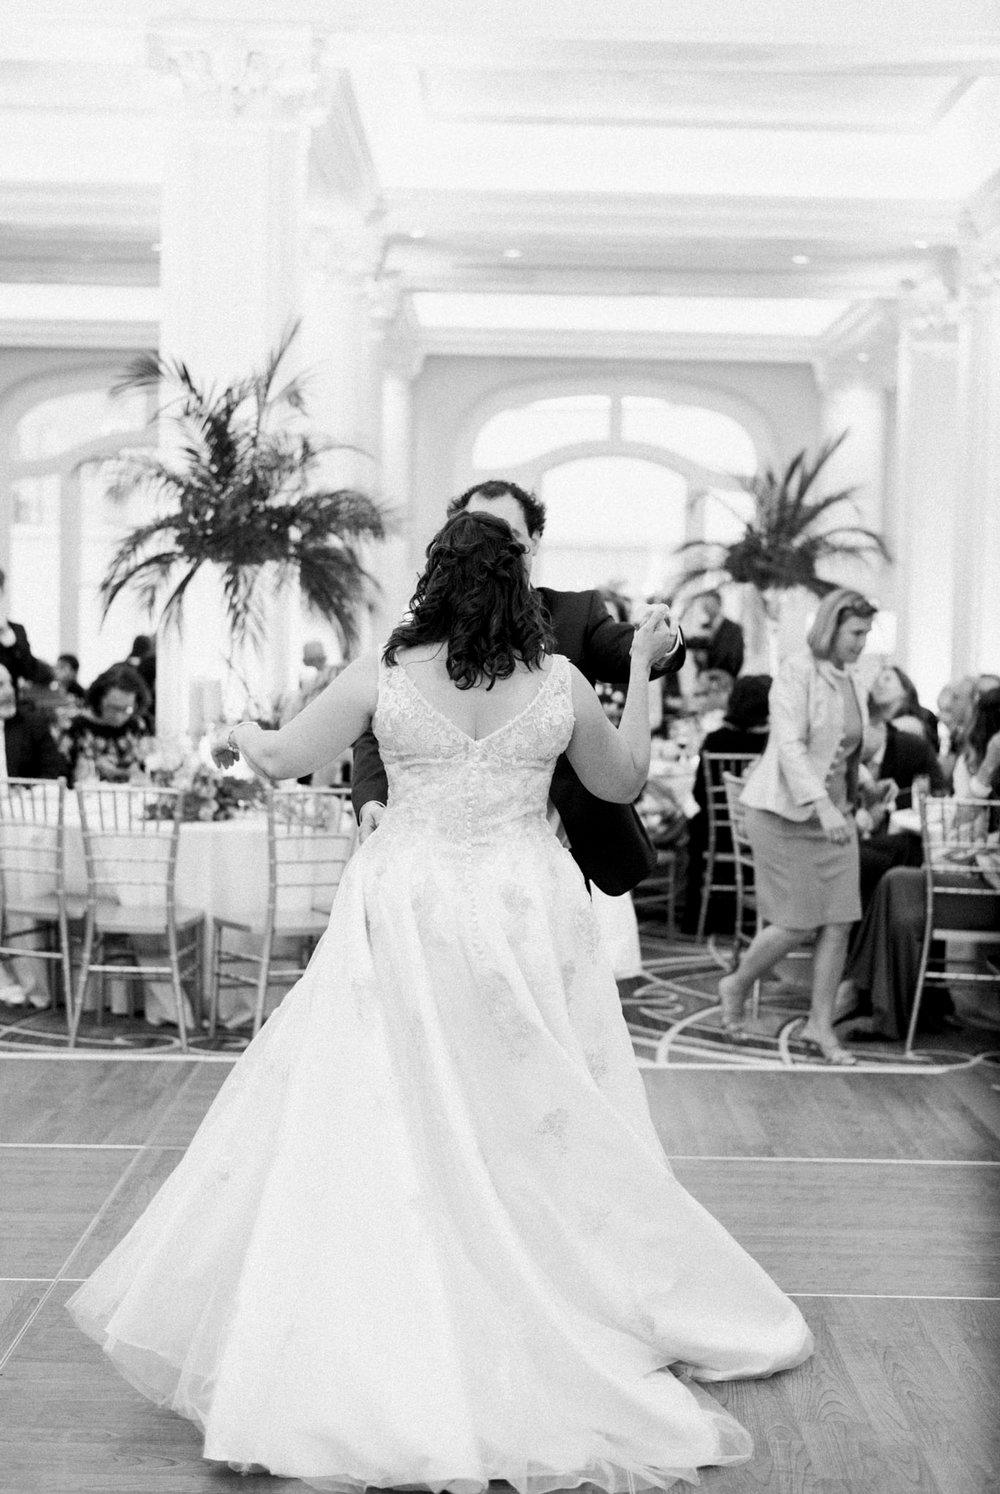 TheVirginianHotel_LynchburgVA_TheVirginianHotelWedding_Virginiaweddingphotographer_Lynchburgvawedding 15.jpg